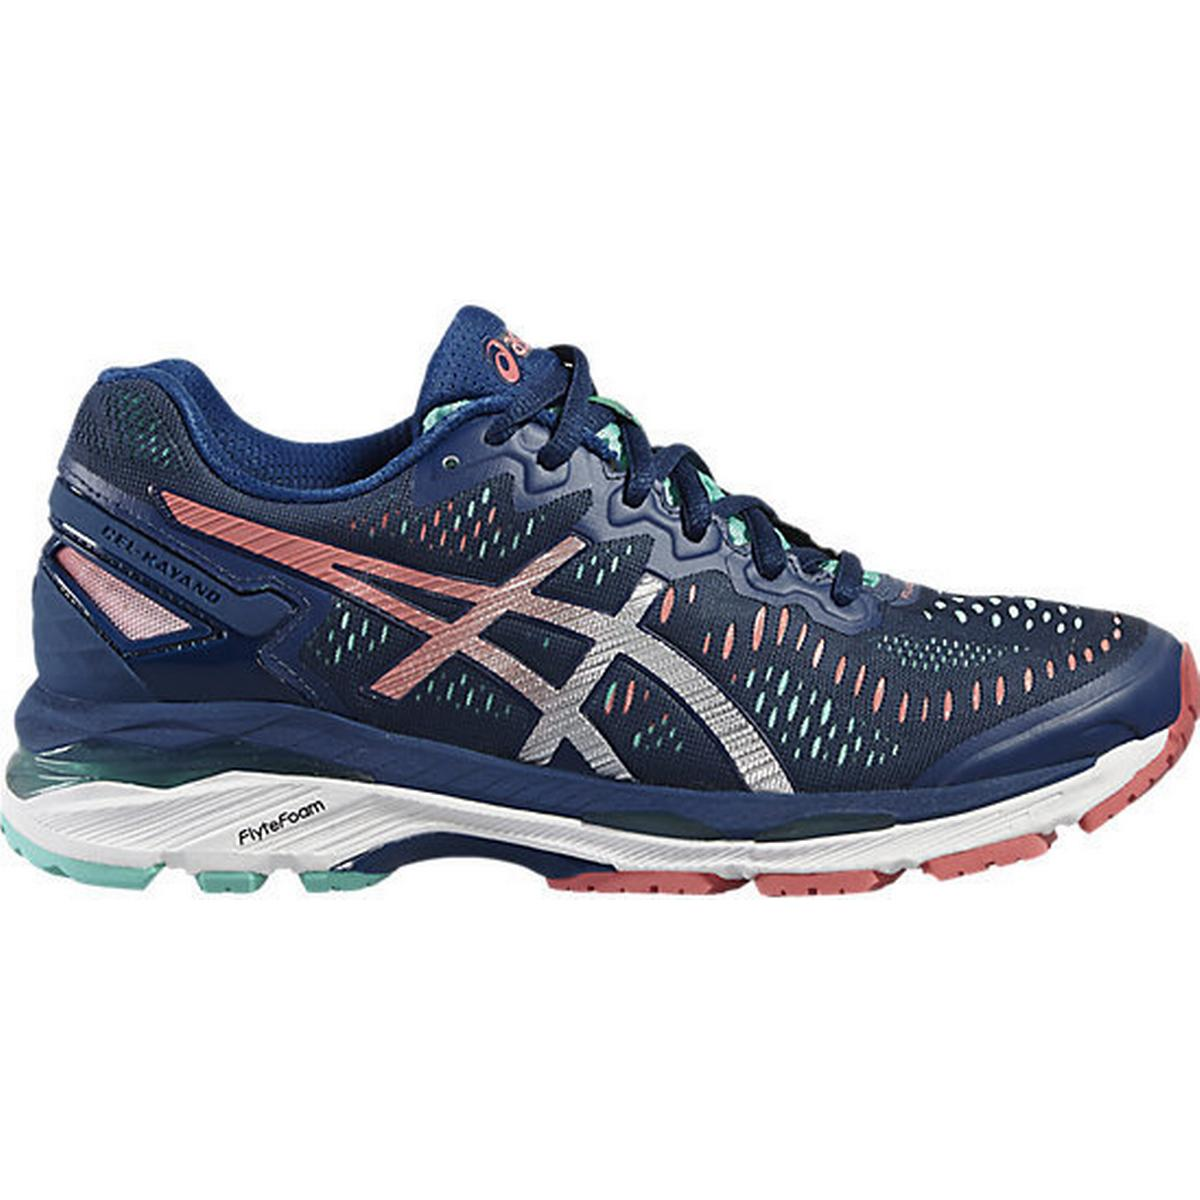 ASICS GEL Luminus 2 T67UQ 4320 Damen Laufschuhe Jogging